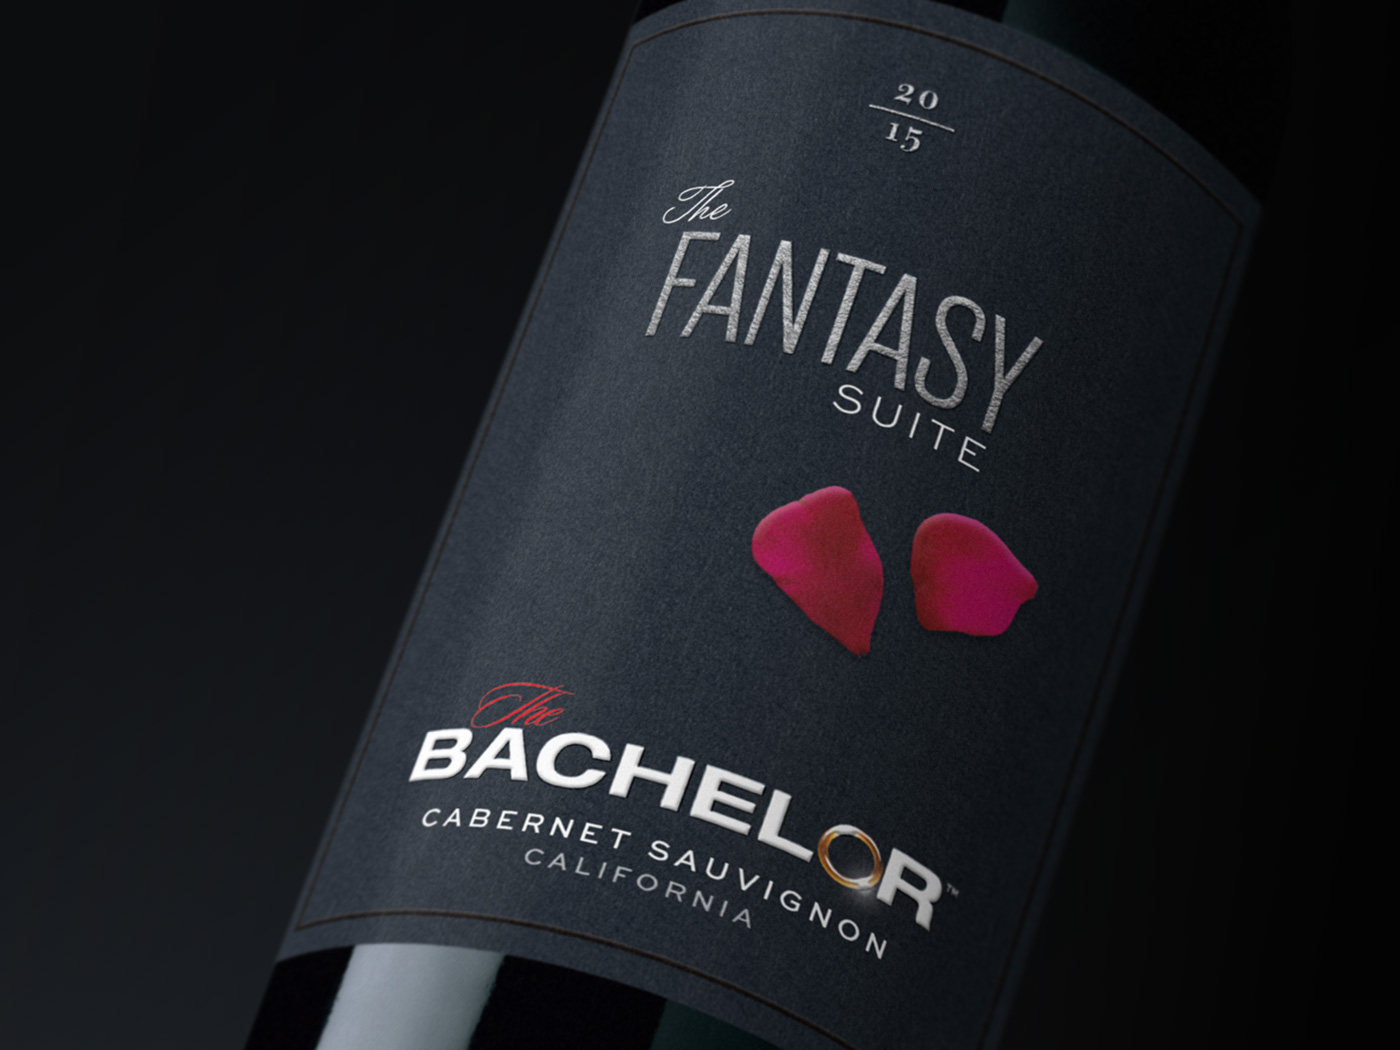 Bachelor Wines - The Fantasy Suite Closeup